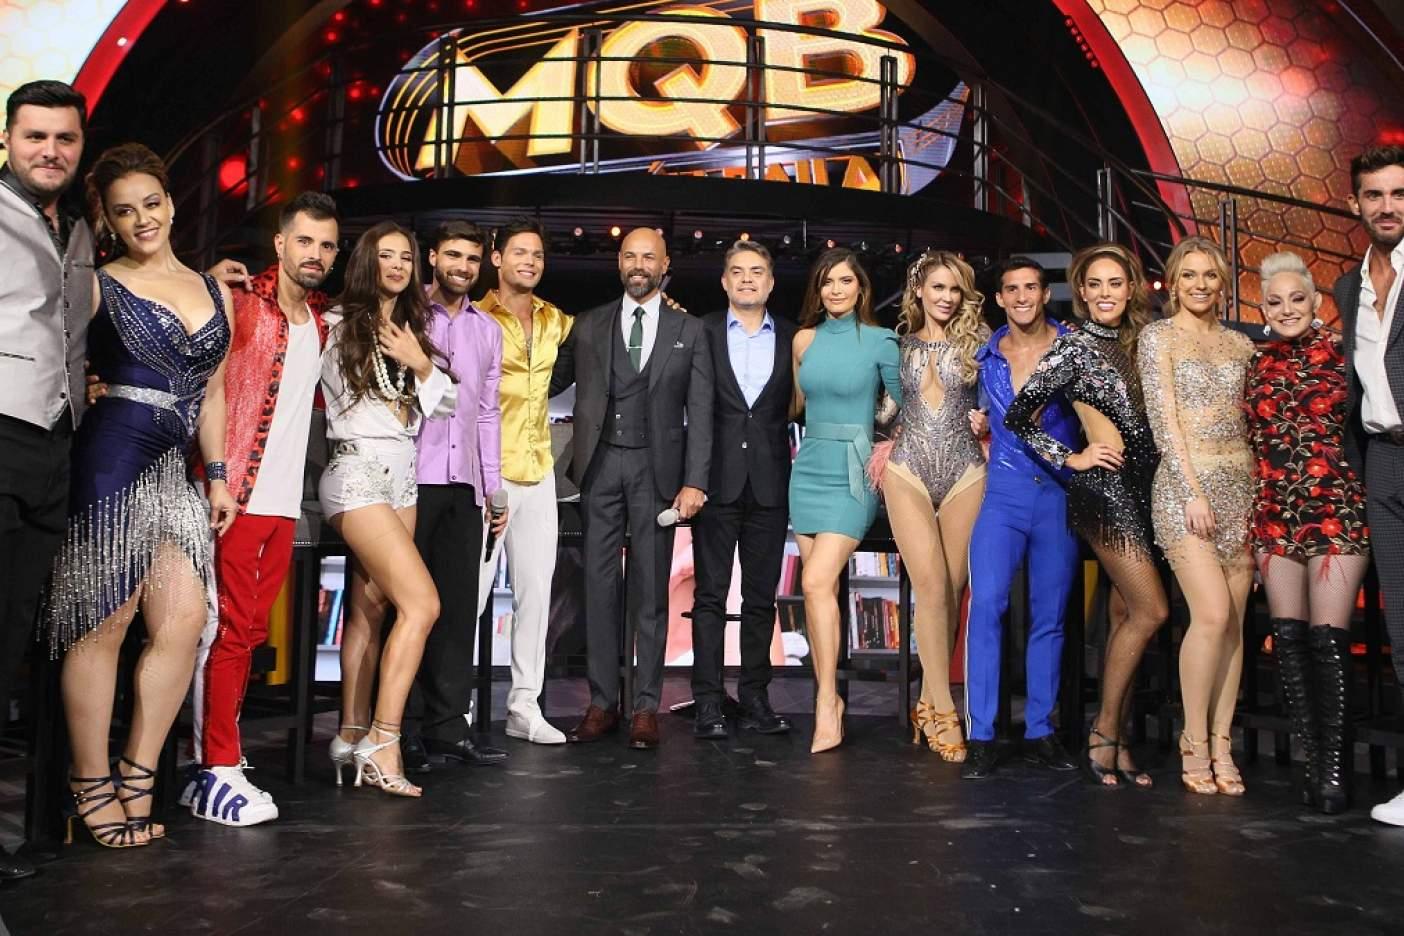 Bailes mujeres sexuale para hombres mazatlán